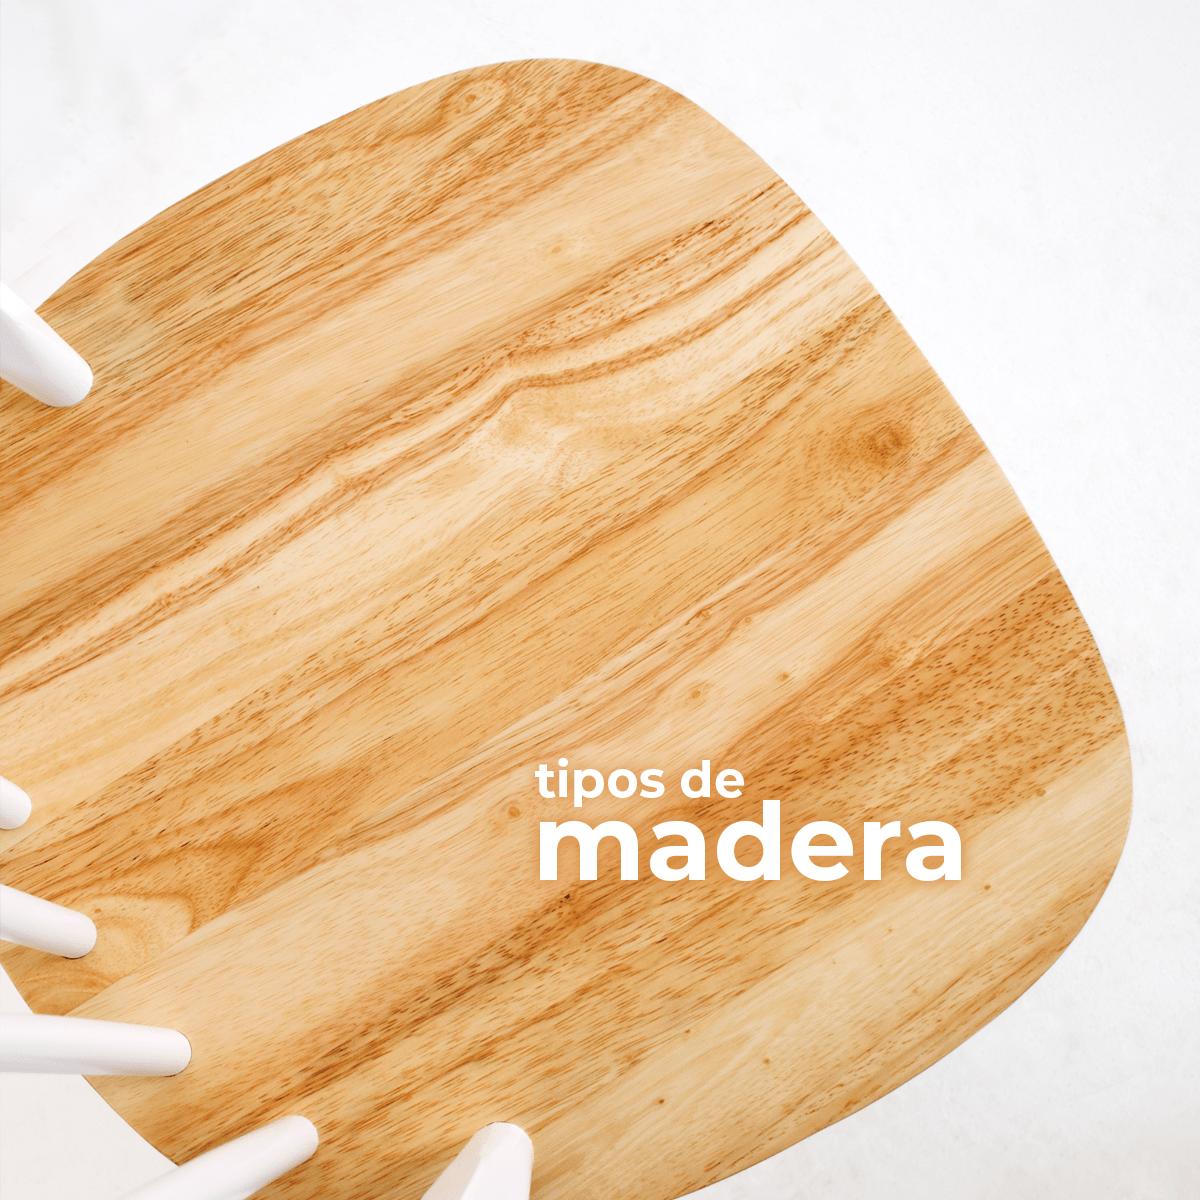 Tipos de madera by Bambó Blau